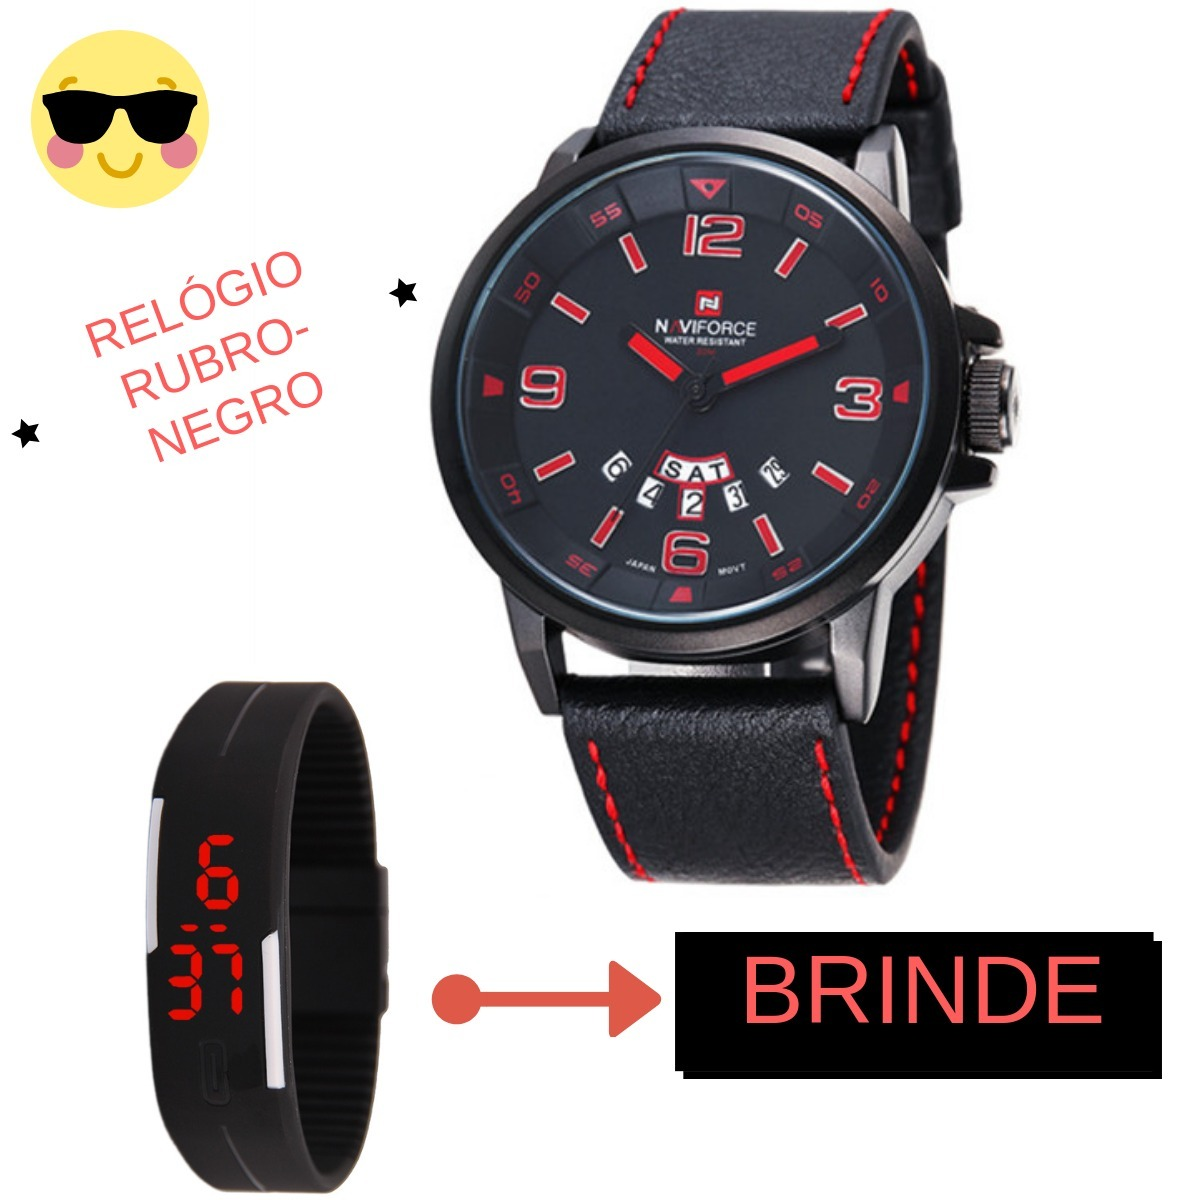 85607b864b8 Relógio Masculino Torcedor Rubro Negro + Brinde - R  48